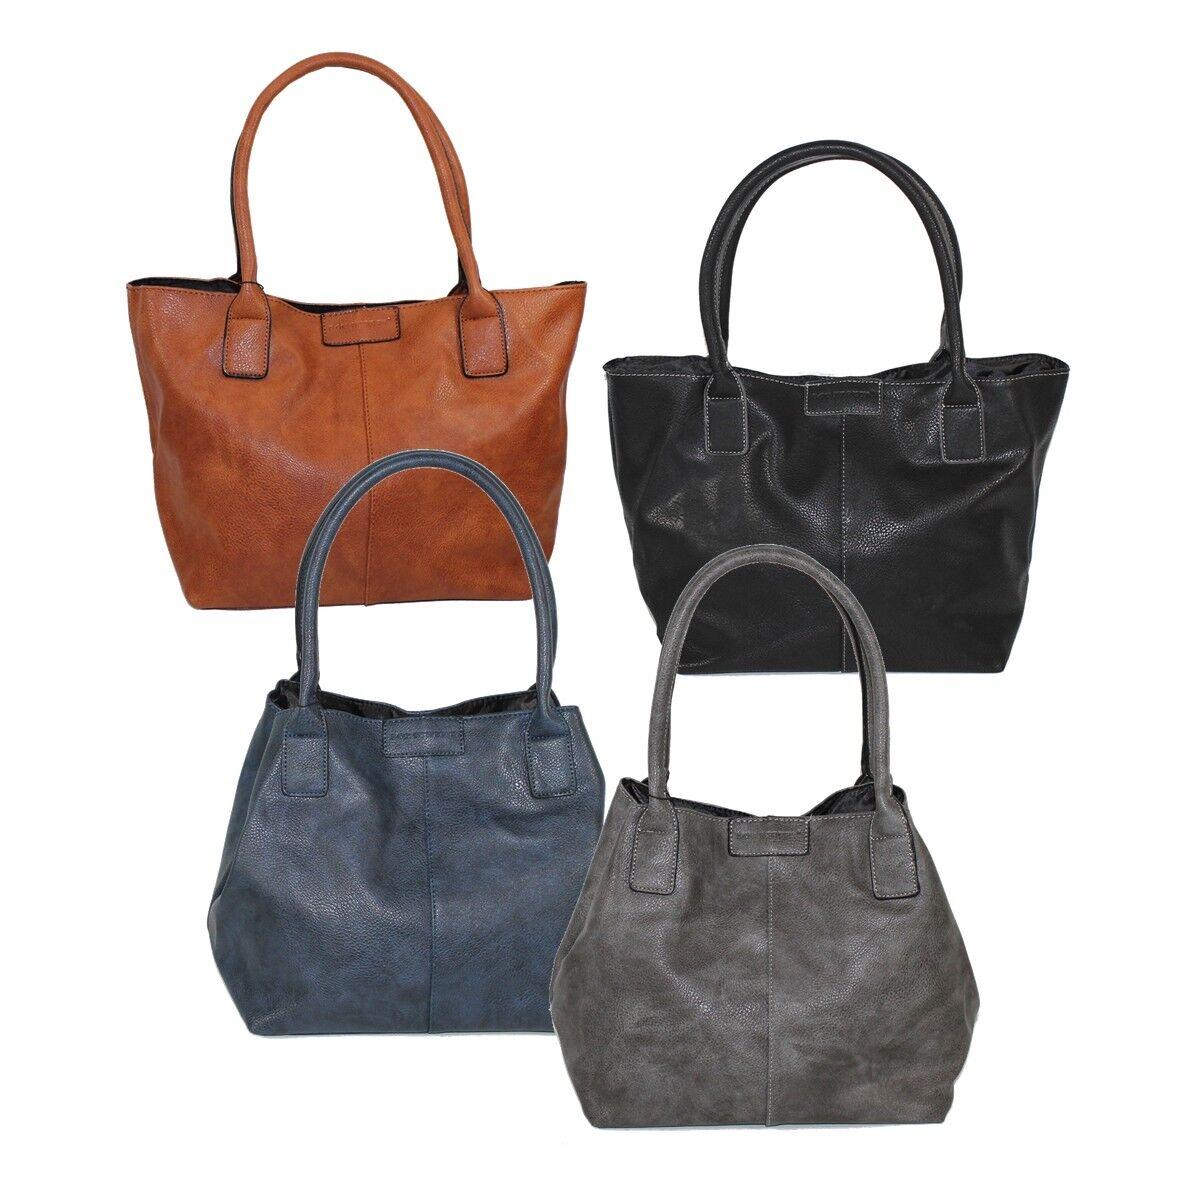 72790077783fc Bag Street Shopper Handtasche Damentasche groß 2 Trage-Varianten Tote Bag  BS0